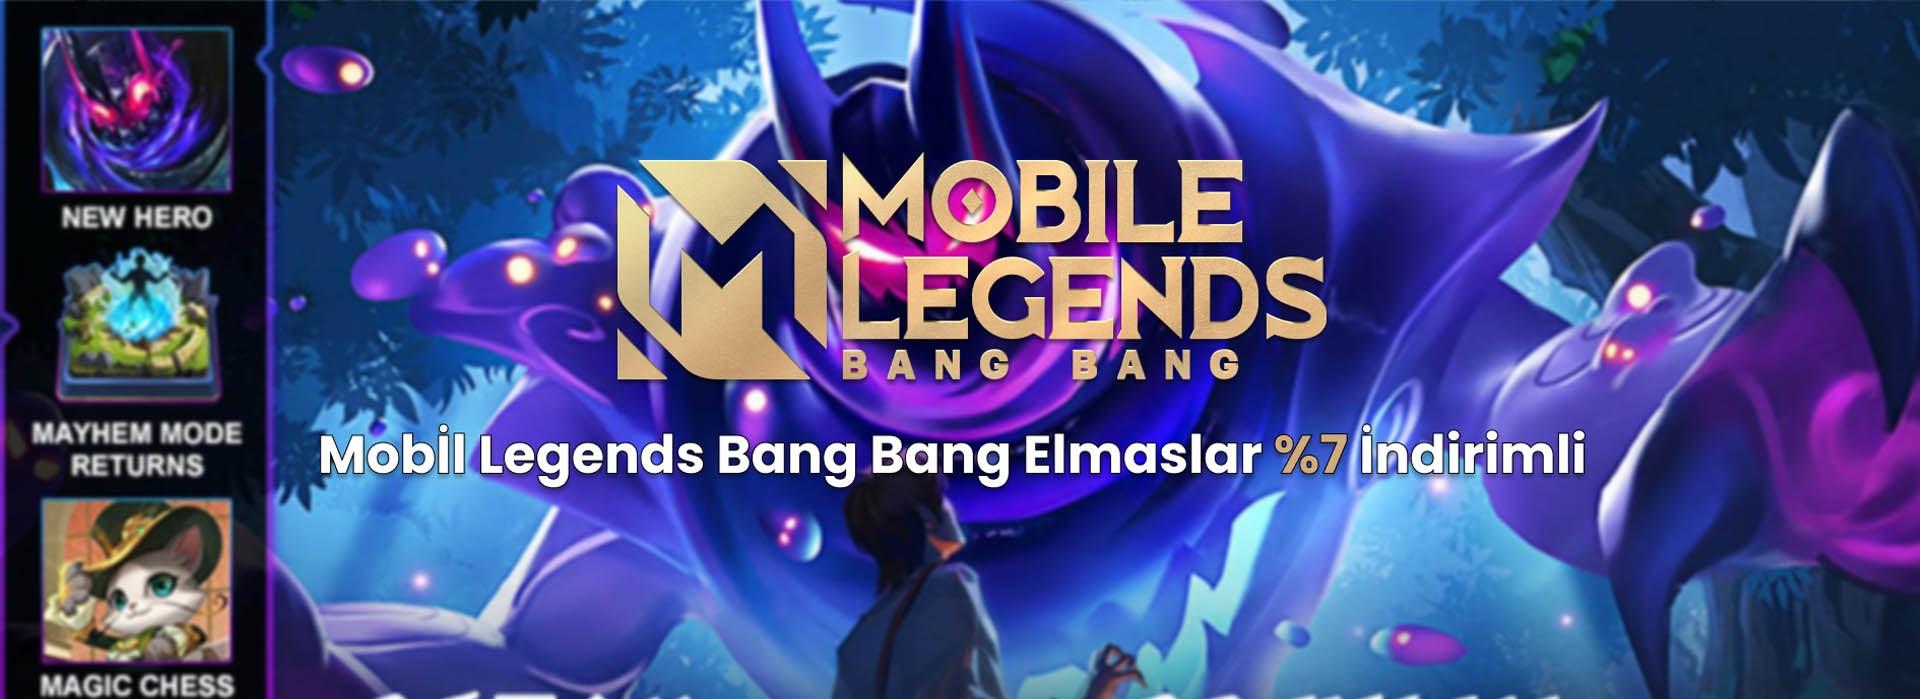 Mobile Legends Bang Bang İndirimli Elmas Satın Al